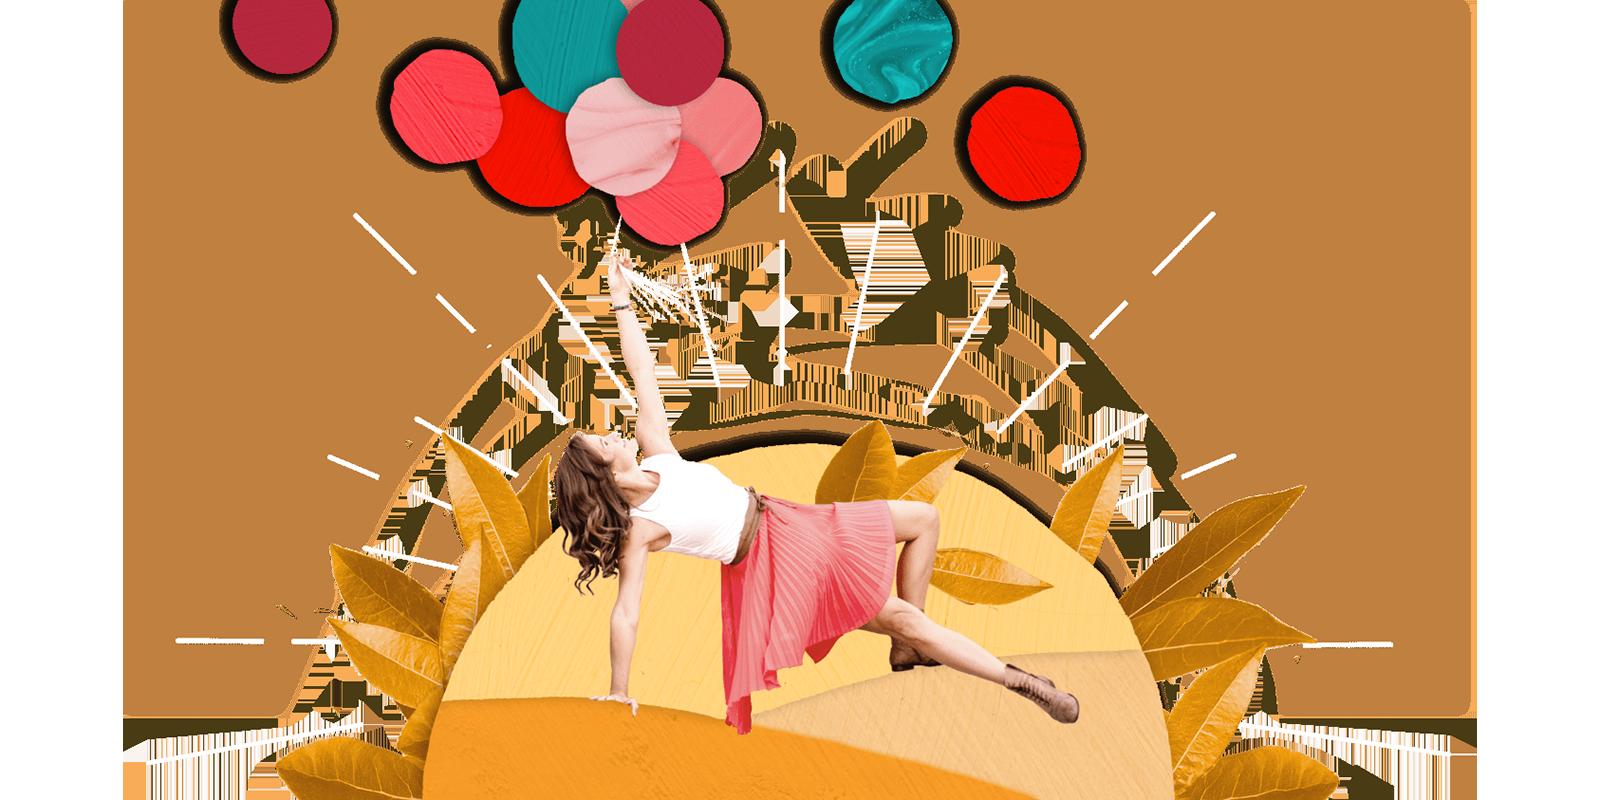 11Nancy in Yoga Pose Collage mit Luftballons